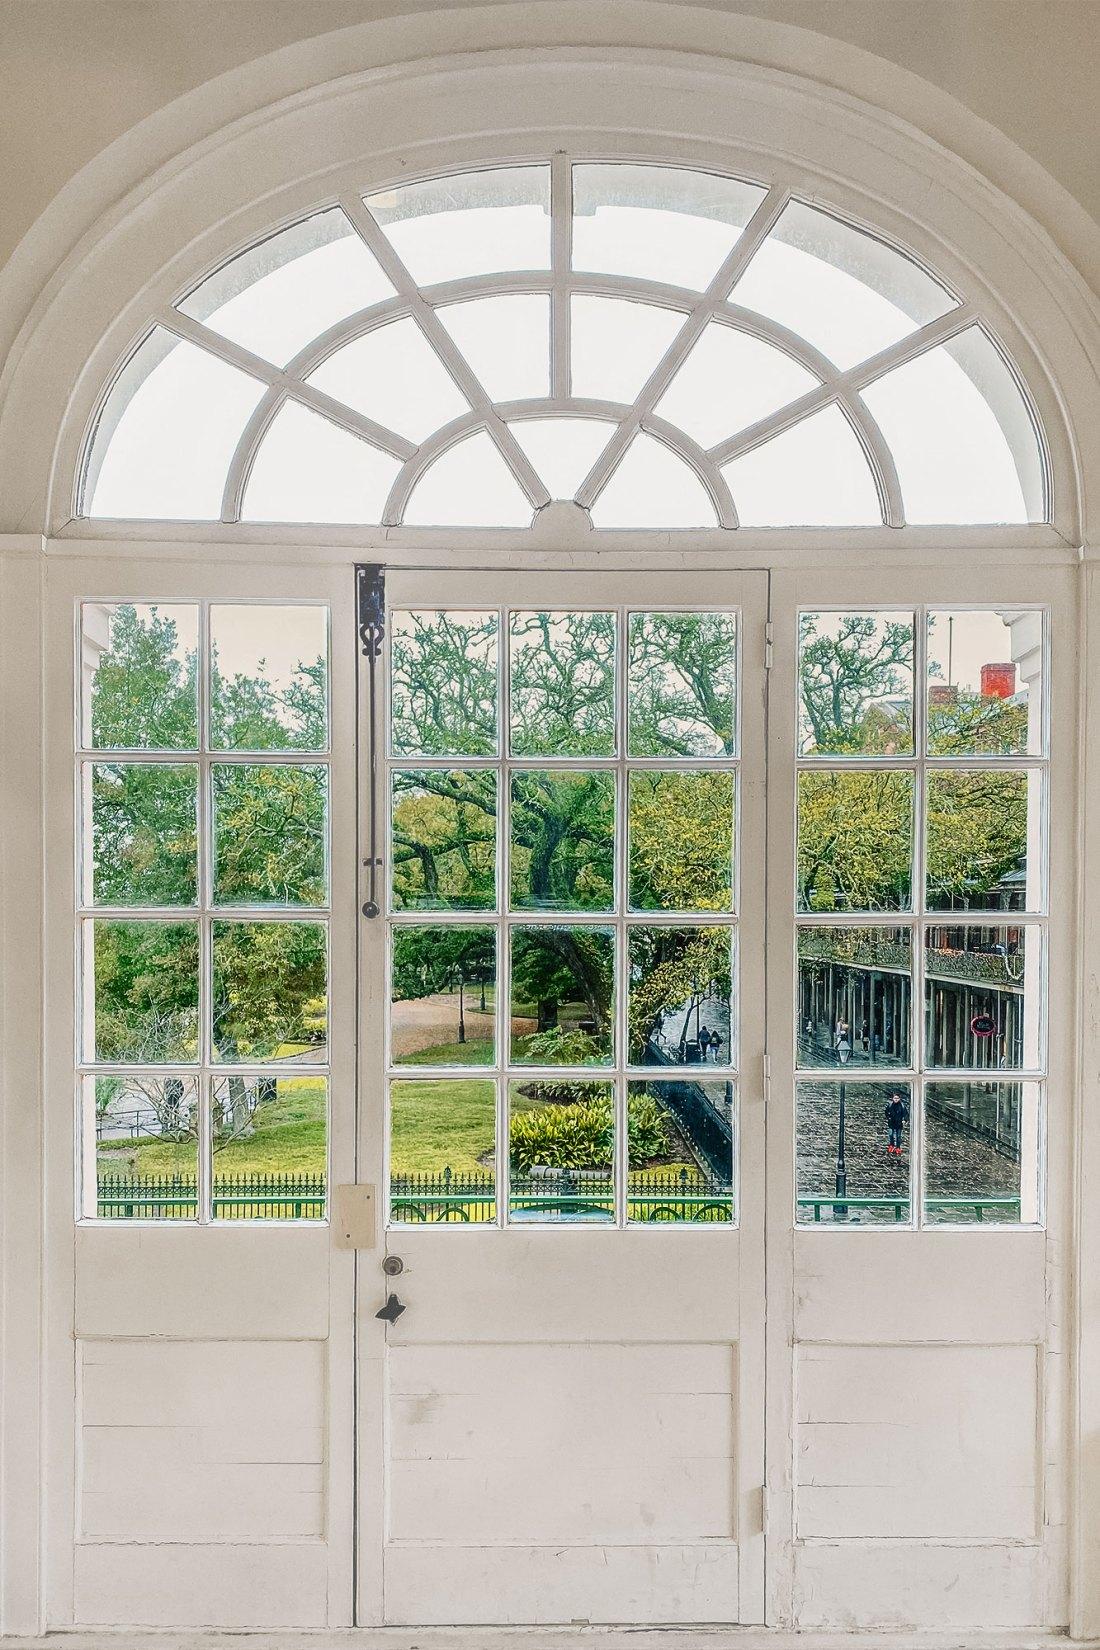 White window frame with green scene